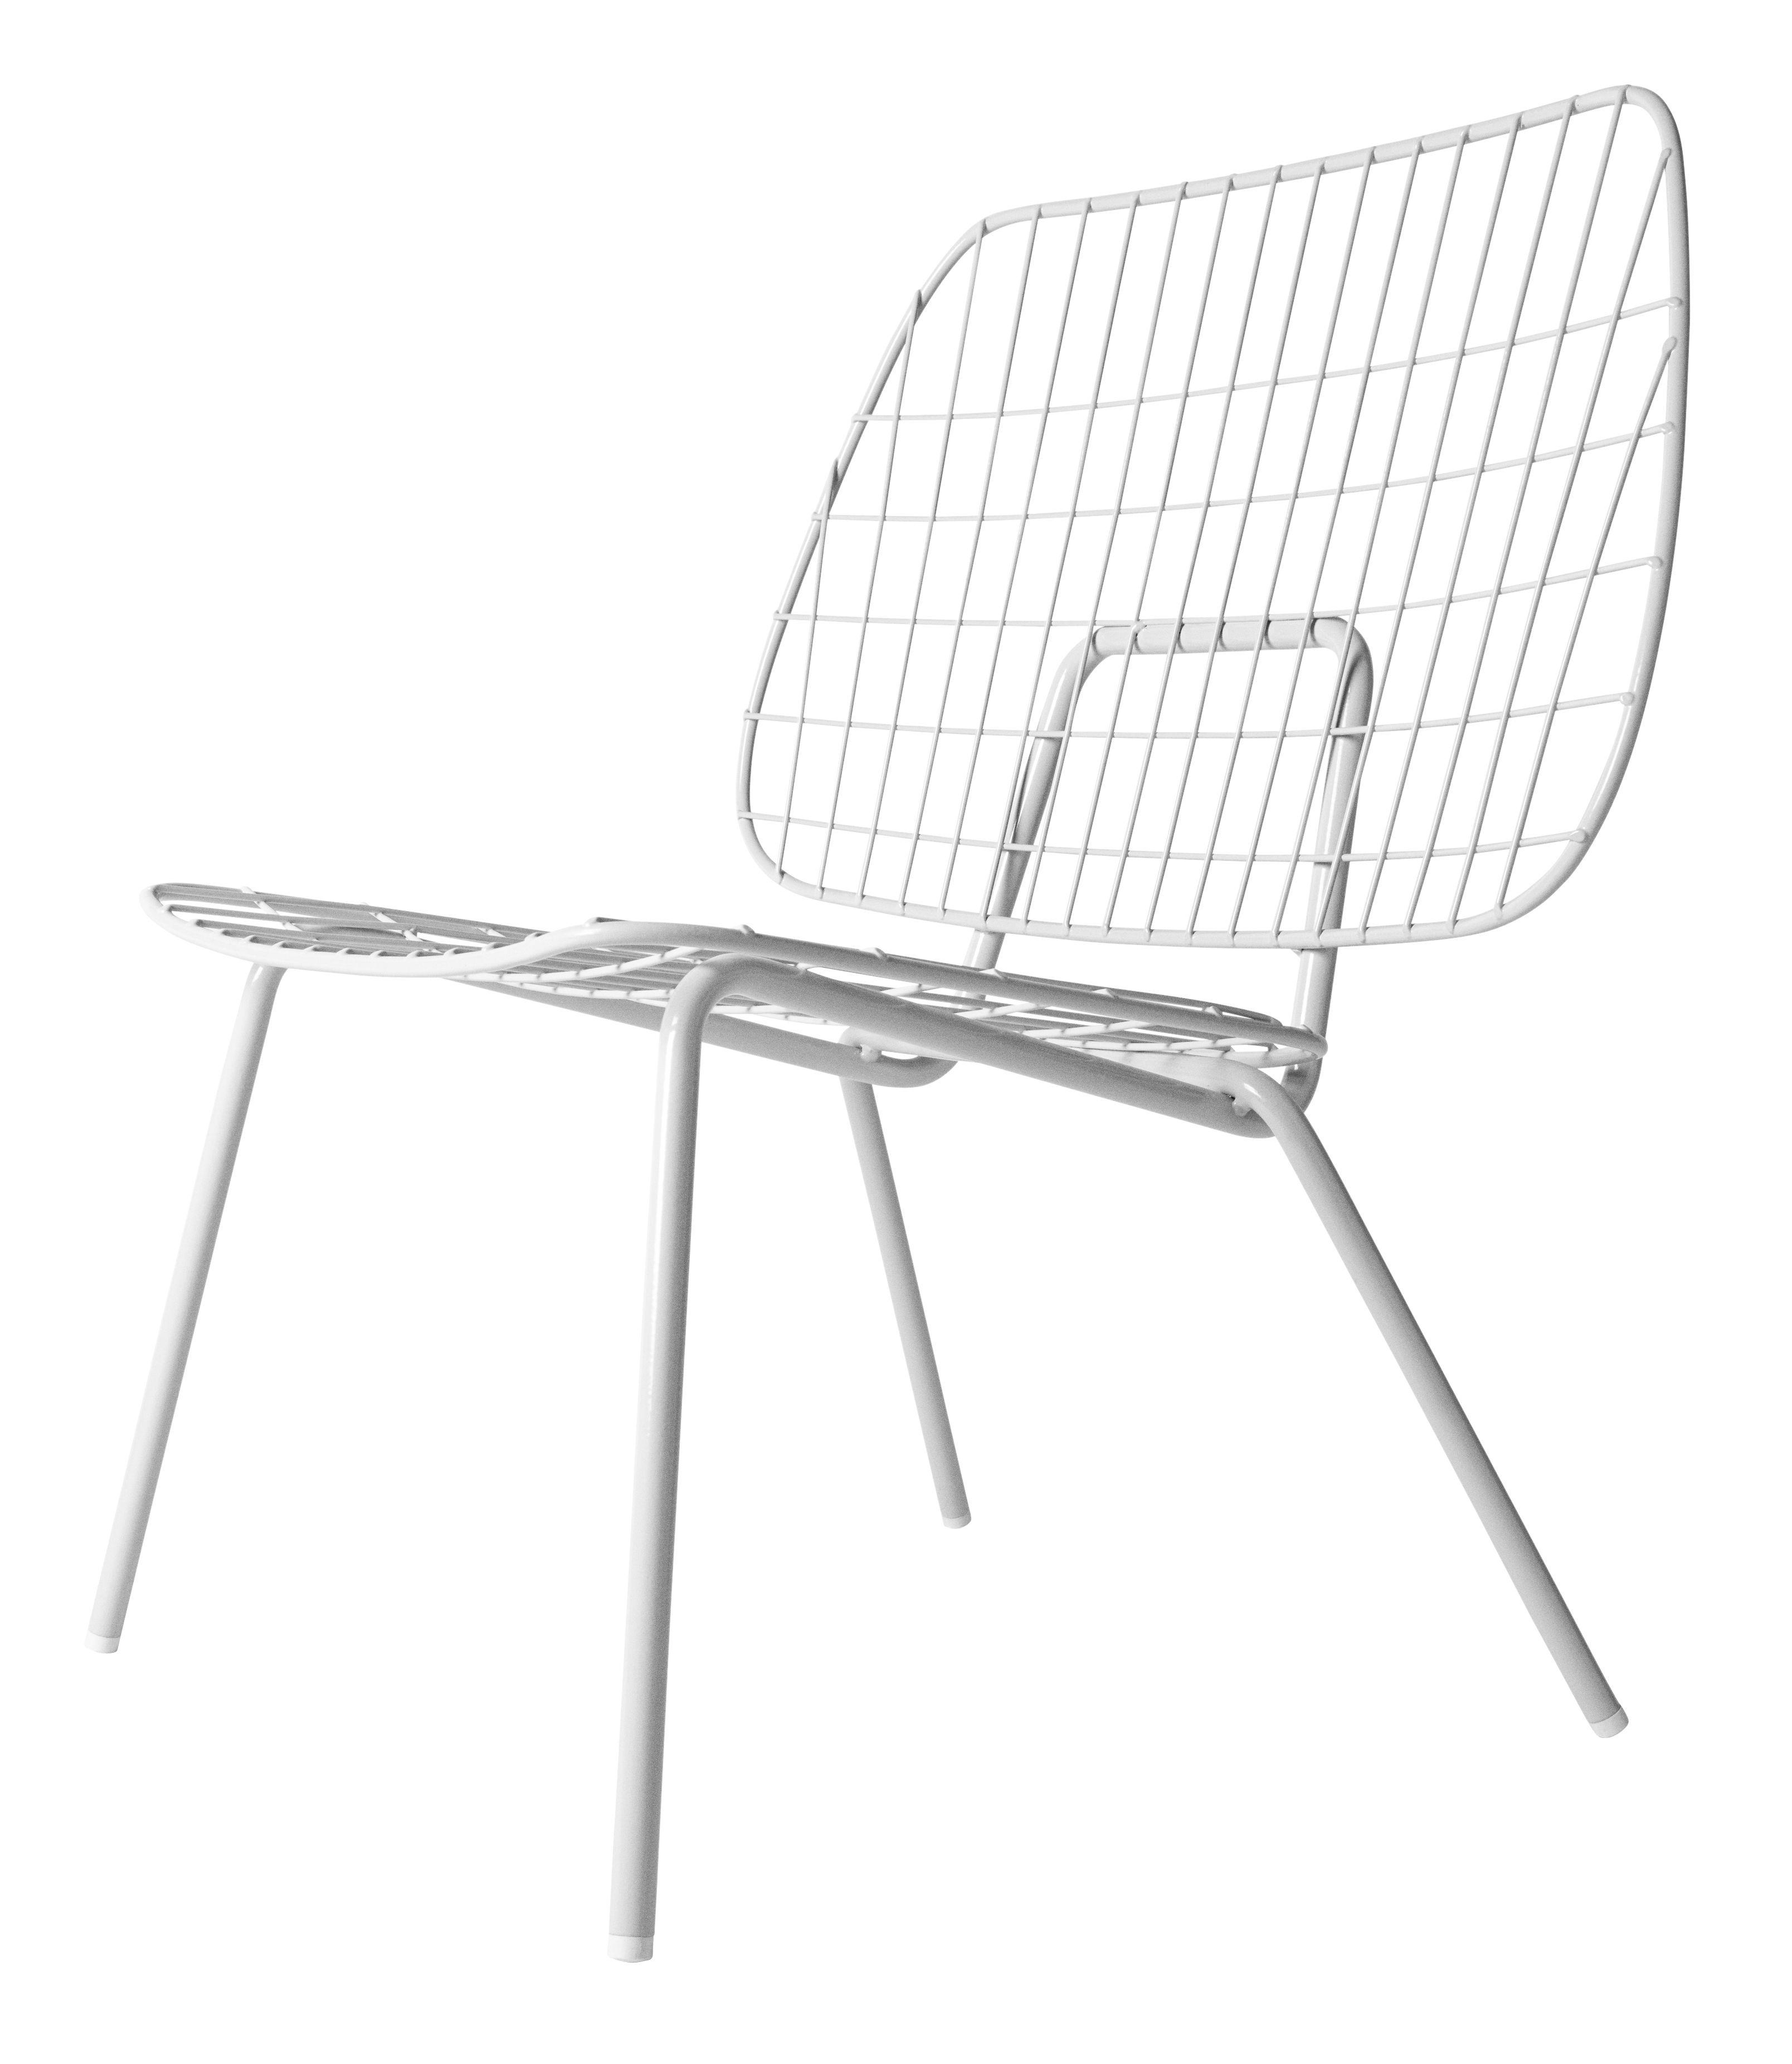 Arredamento - Poltrone design  - Poltrona bassa WM String Lounge / Acciaio - Menu - Bianco - Acier laqué époxy